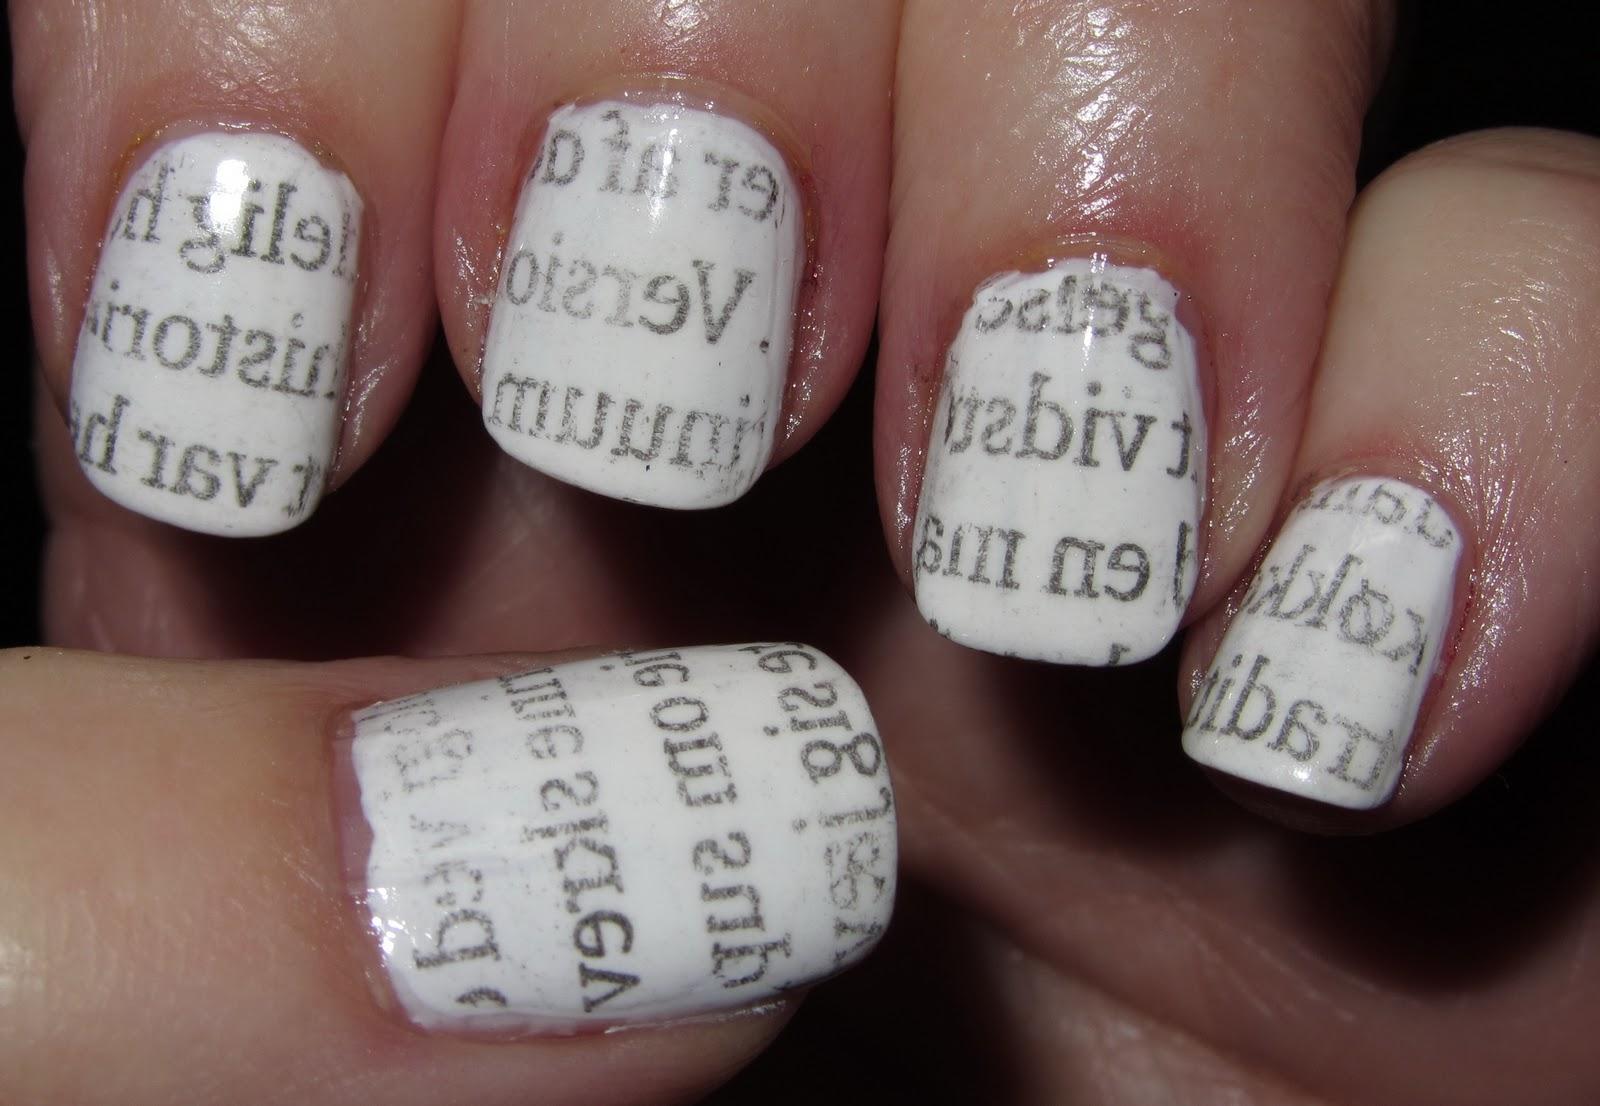 Marias Nail Art and Polish Blog: Newspaper nails – avis negle ...